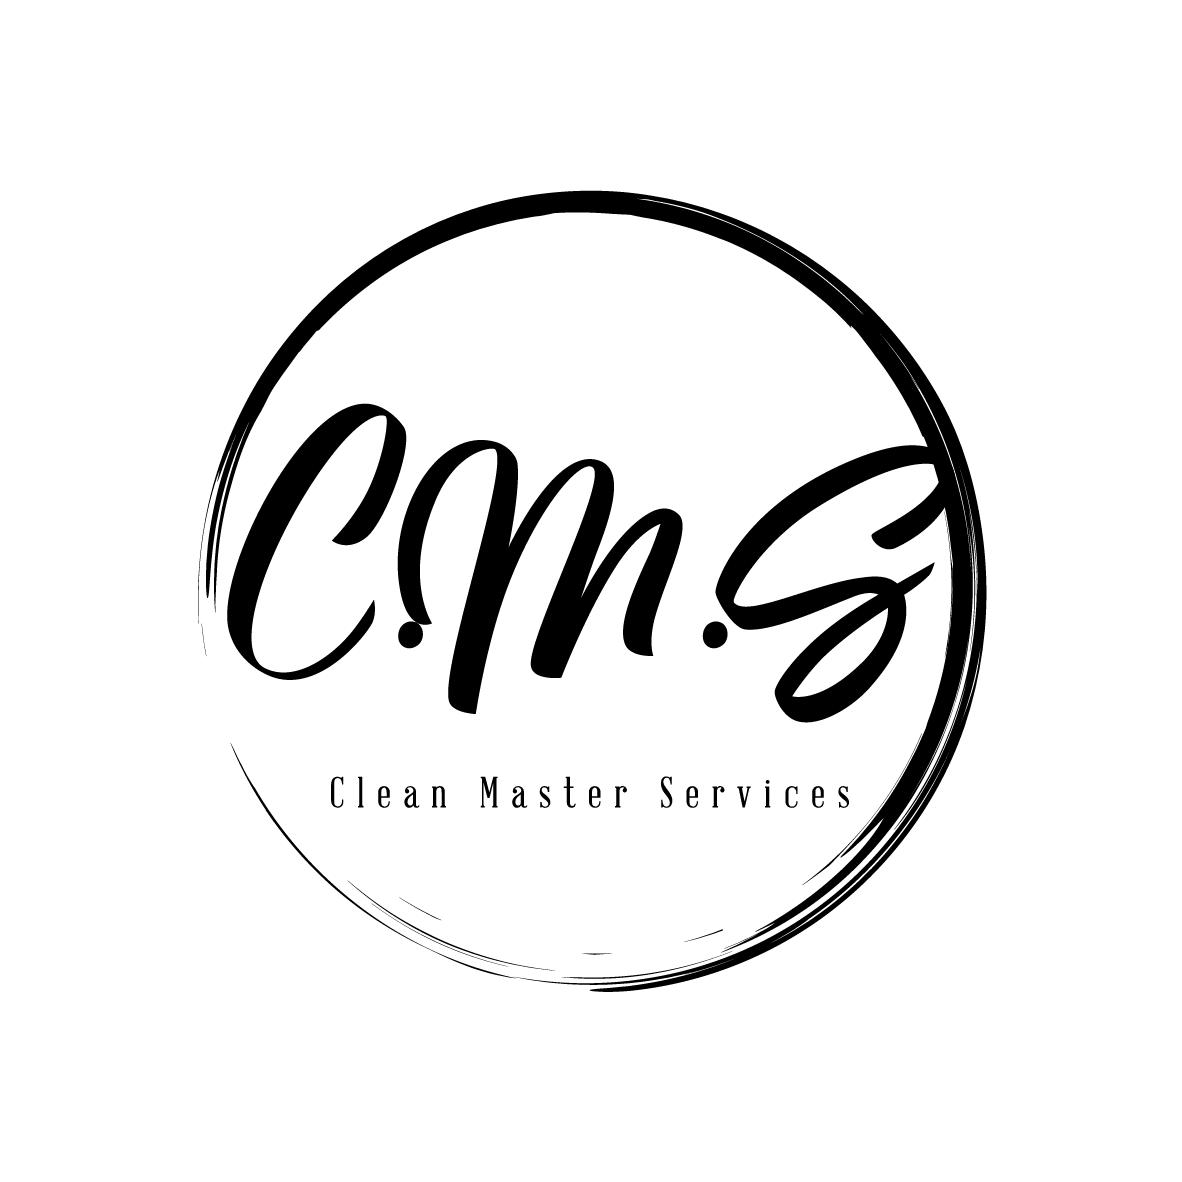 CV_Sponsor Logos-2019-Website-15.png